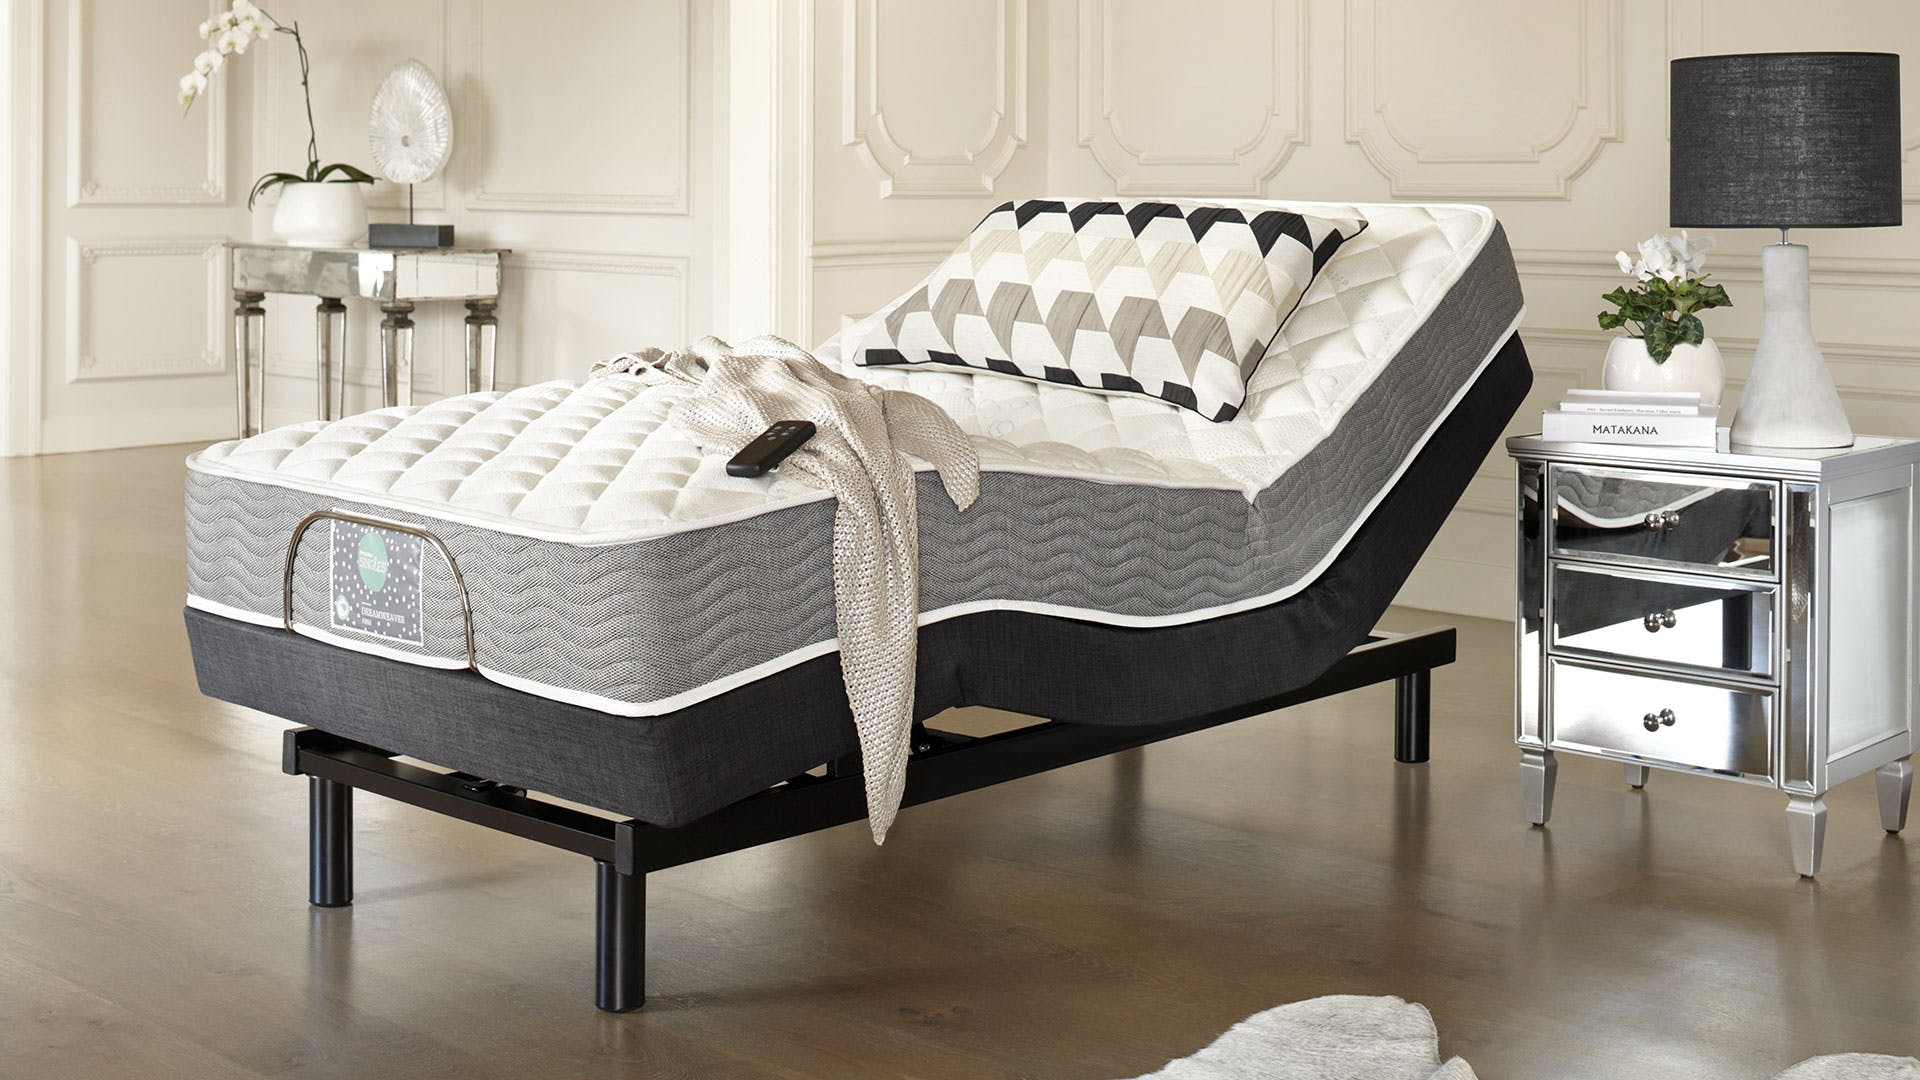 Adjustable Single Bed Base : Sleepmaker dreamweaver firm king single mattress with